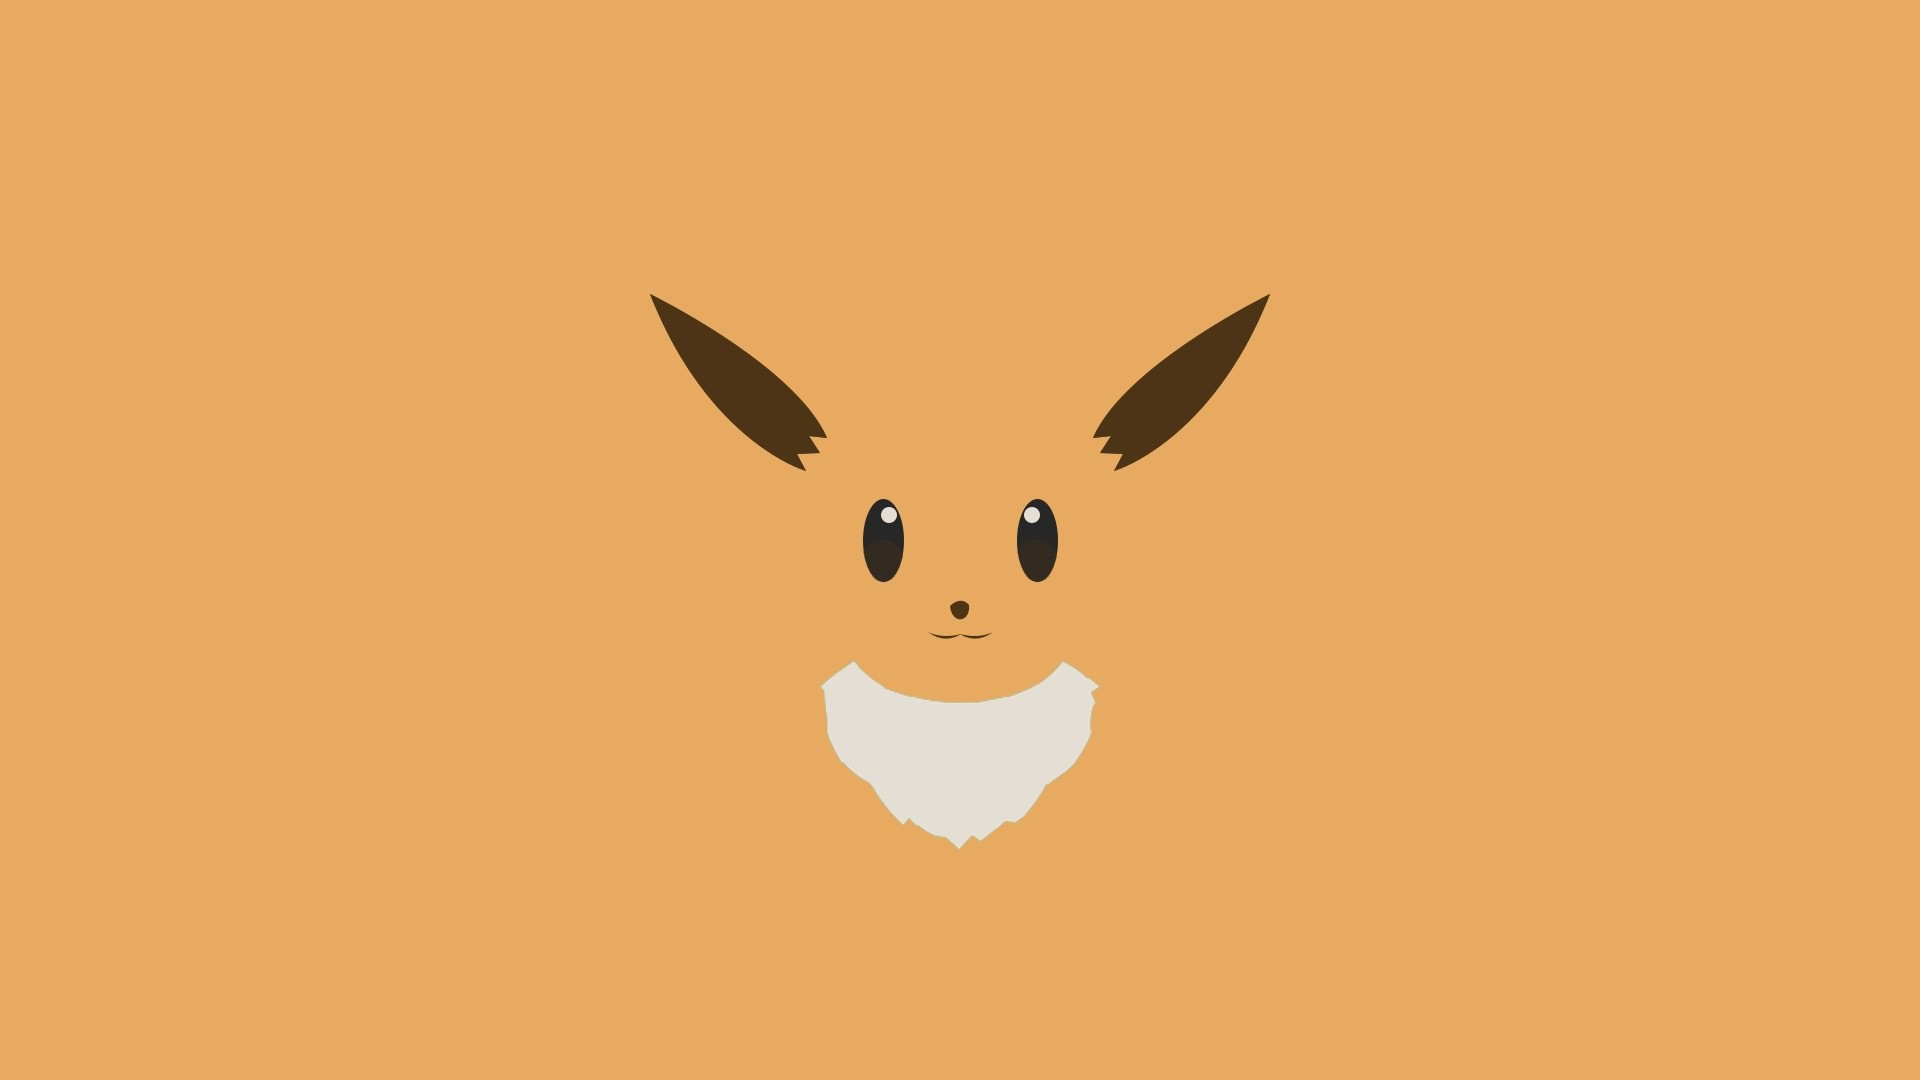 Pokemon/ Pokemon GO Design | Eevee Wallpaper